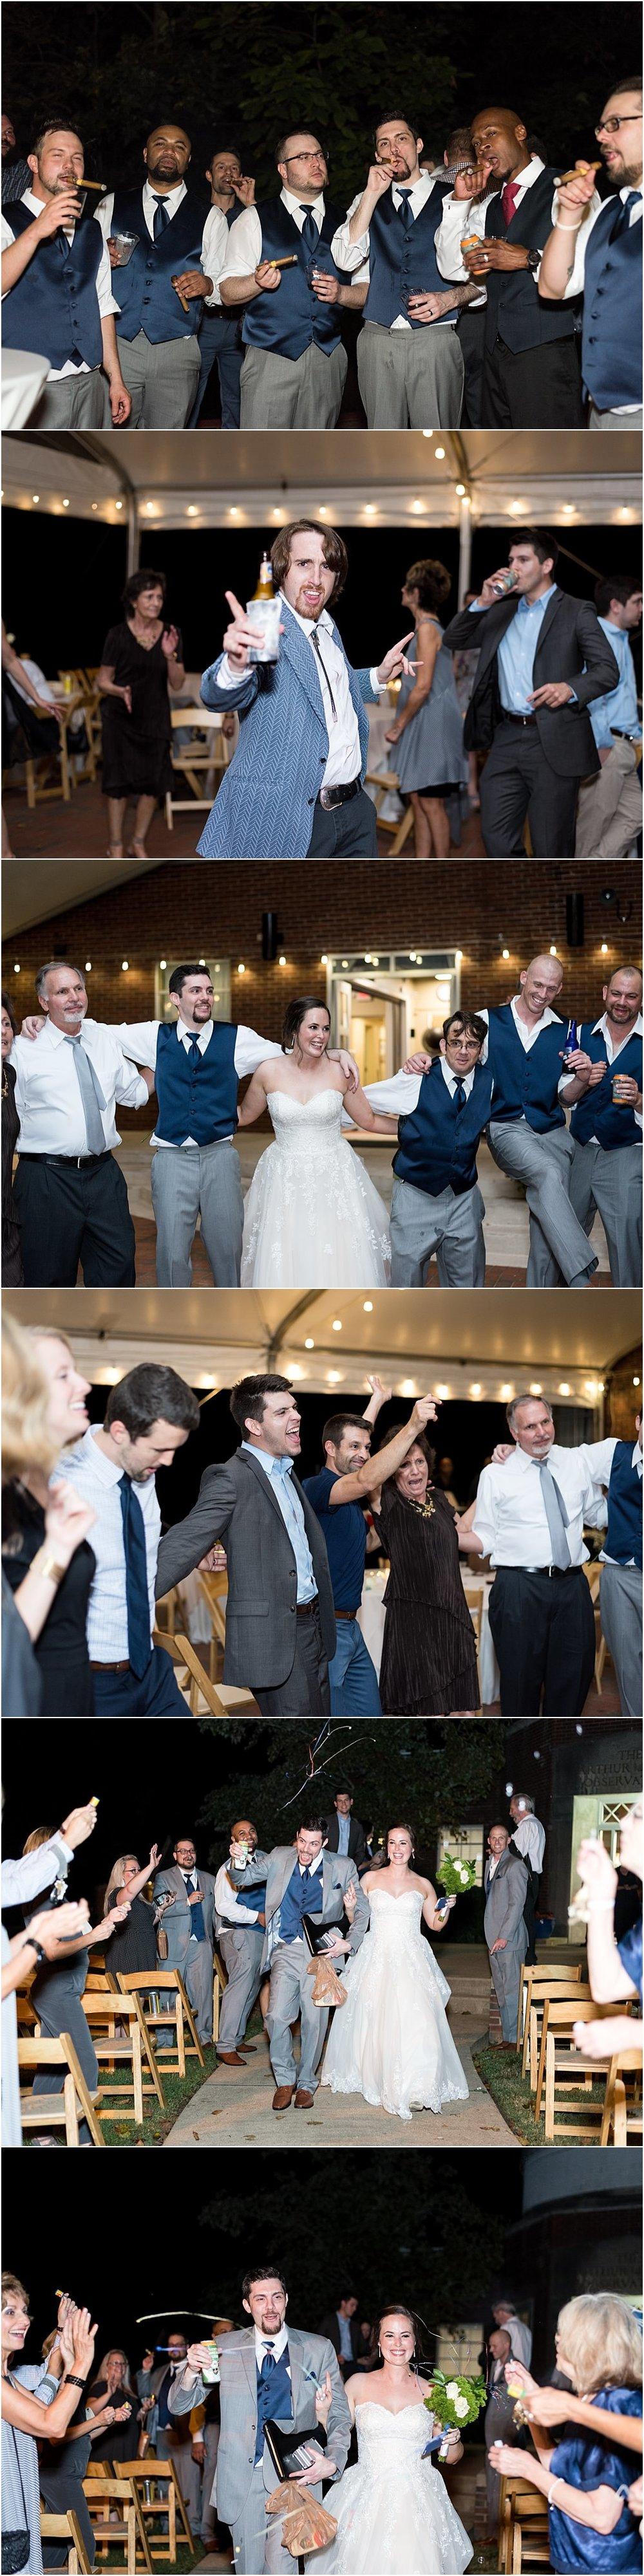 Nolan-And-Leanna-Vanderbilt-Dyer-Observatory-Wedding-in-Brentwood-TN-Nashville-Wedding-Photographers+14